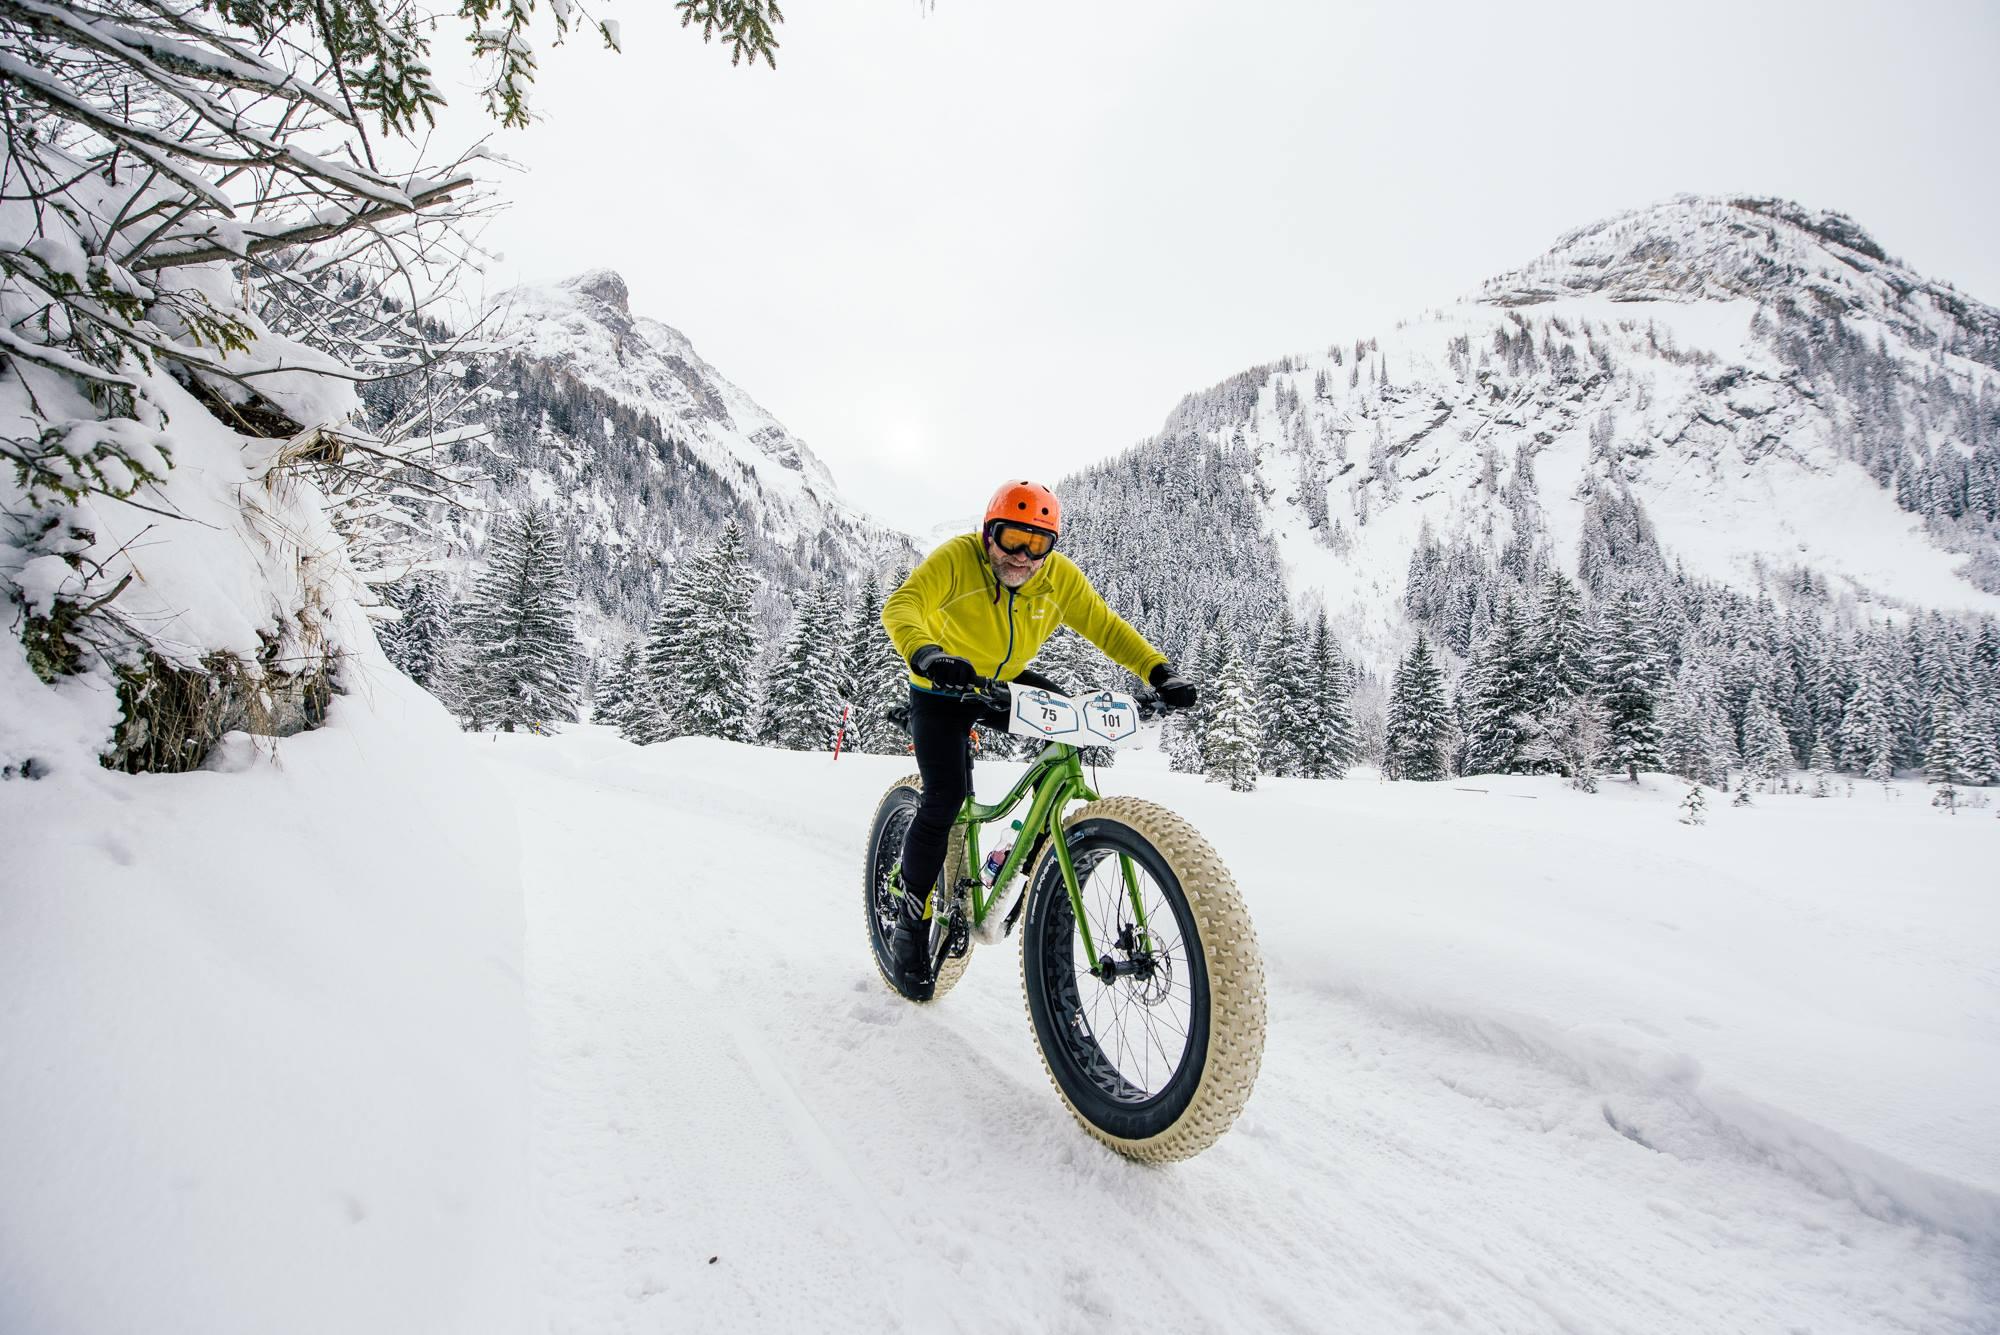 6cd79e0c2 What Type of Mountain Bike Should I Buy  - Singletracks Mountain ...